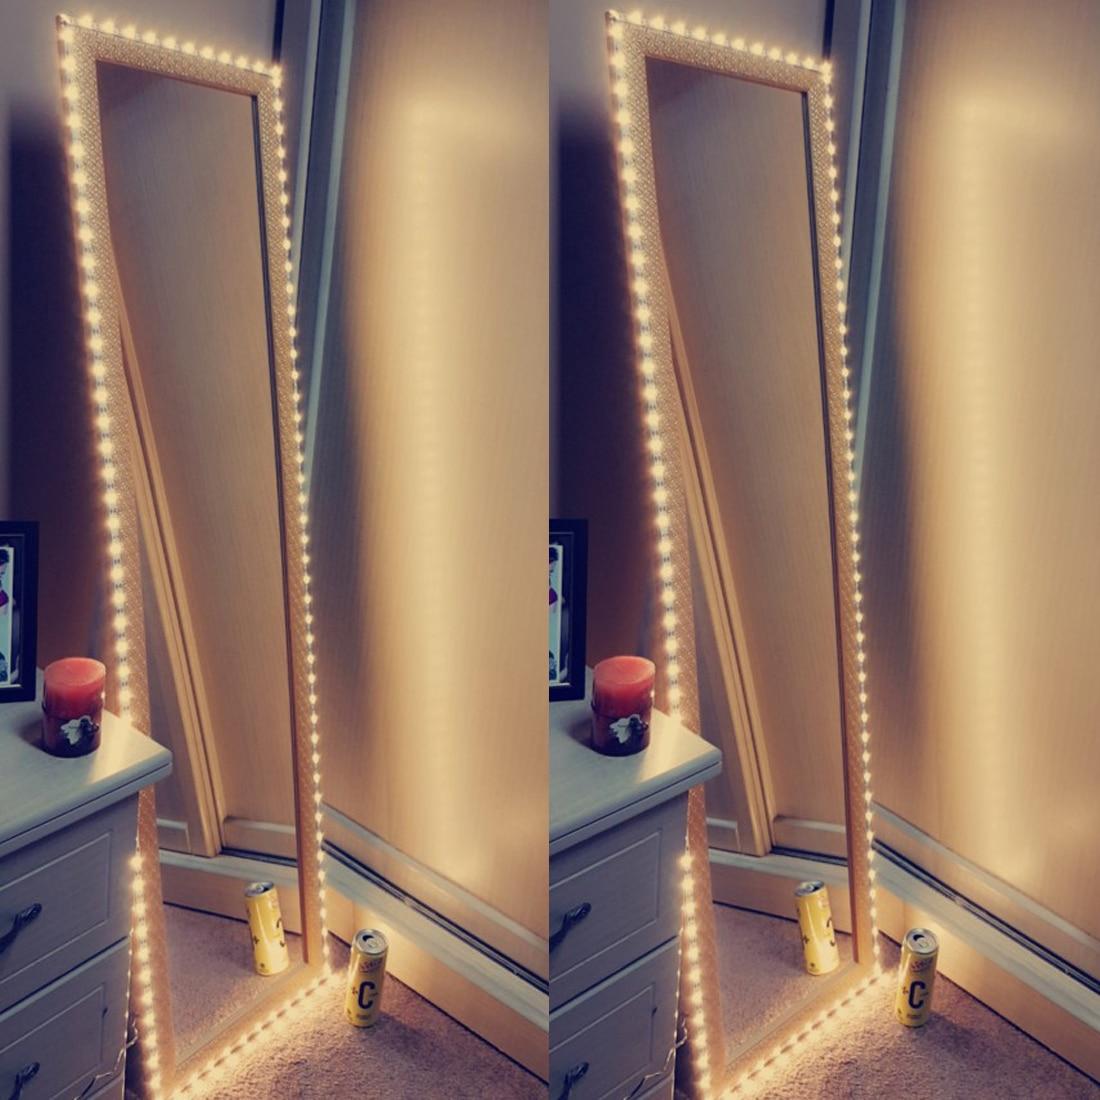 Vanity Makeup Mirror Light 5V USB LED Flexible Tape USB Cable Powered Dressing mirror Lamp Decor 0.5m -5m(China)